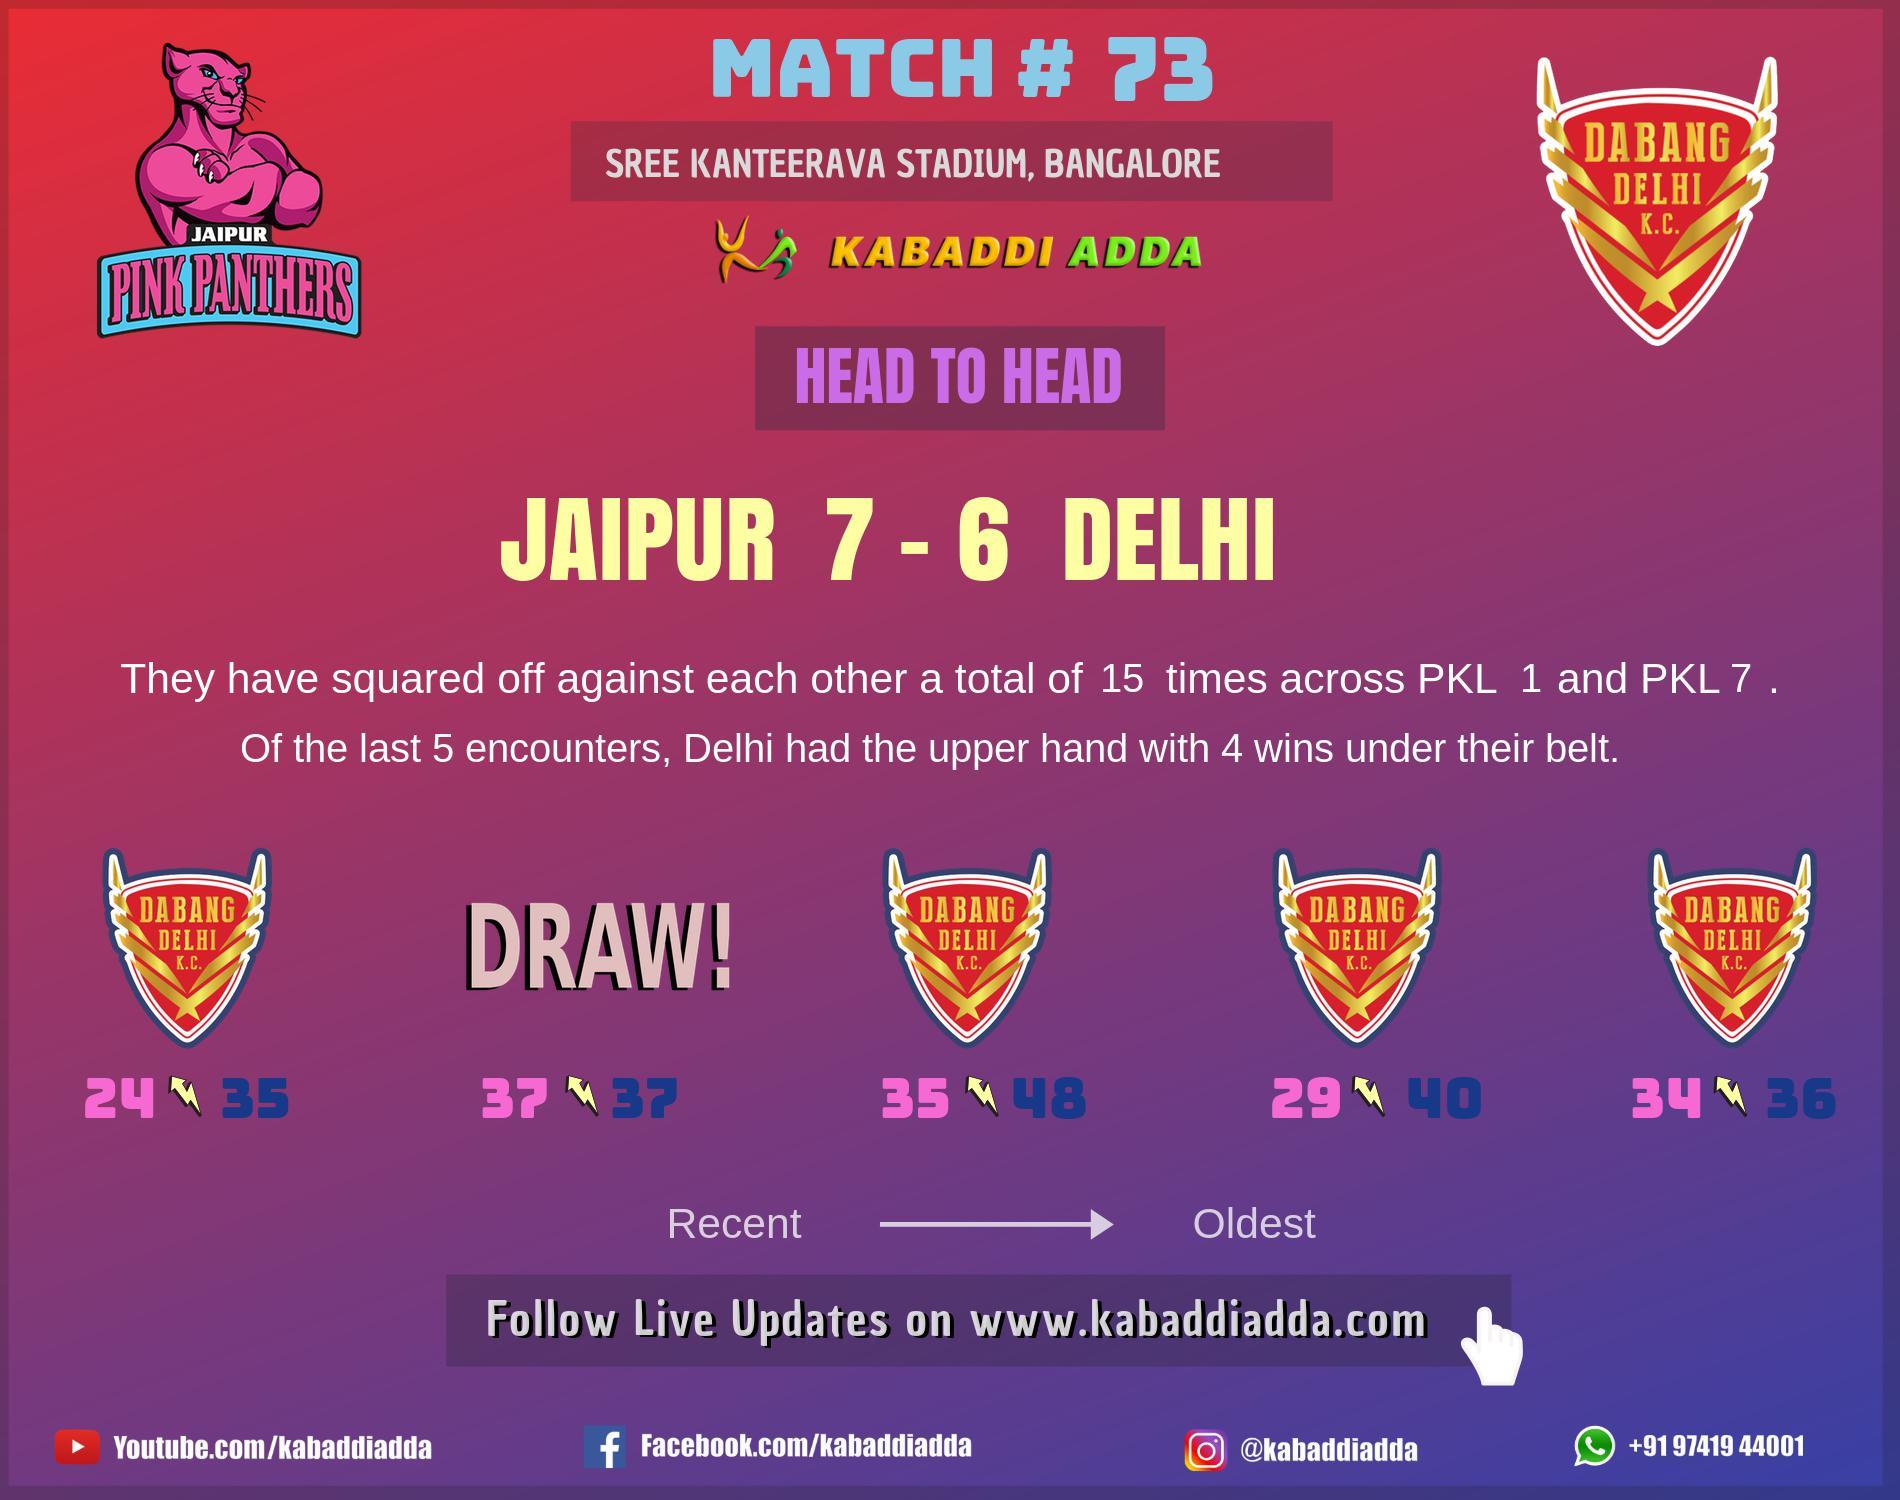 Jaipur Pink Panthers is playing against Dabang Delhi